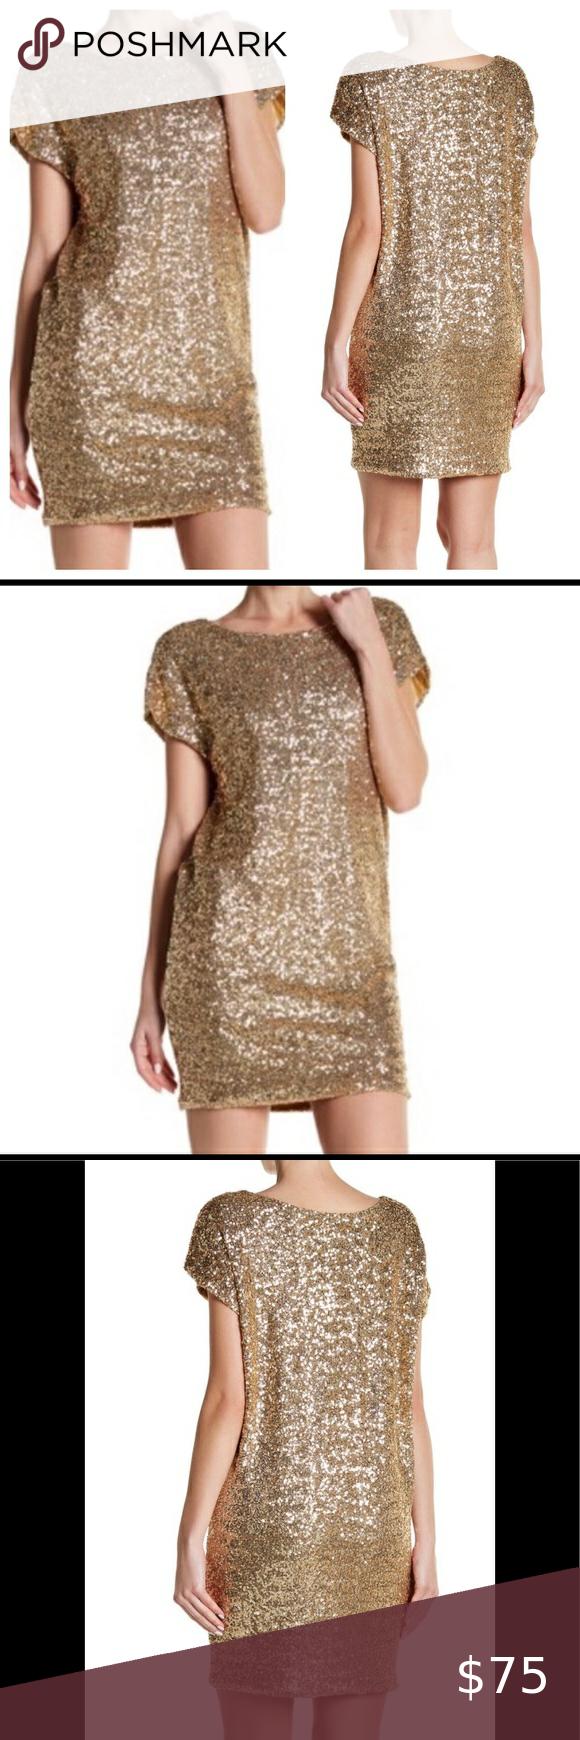 Vertigo Sequin Shift Dress Gold Small Dresses Fashion Clothes Design [ 1740 x 580 Pixel ]